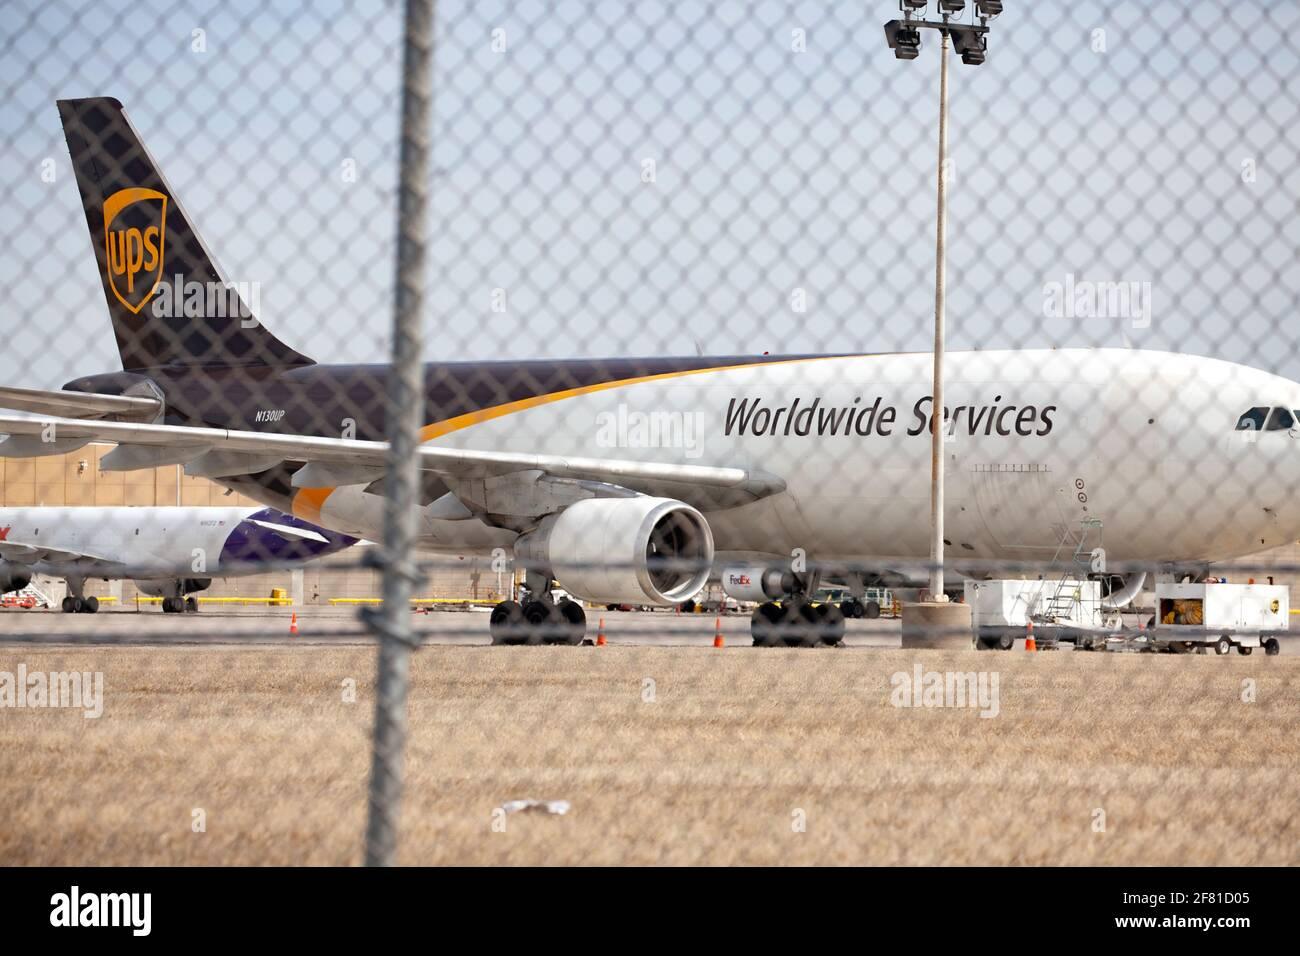 UPS Worldwide Services Airplane parked on apron at the Minneapolis St Paul International Airport. Minneapolis Minnesota MN USA Stock Photo